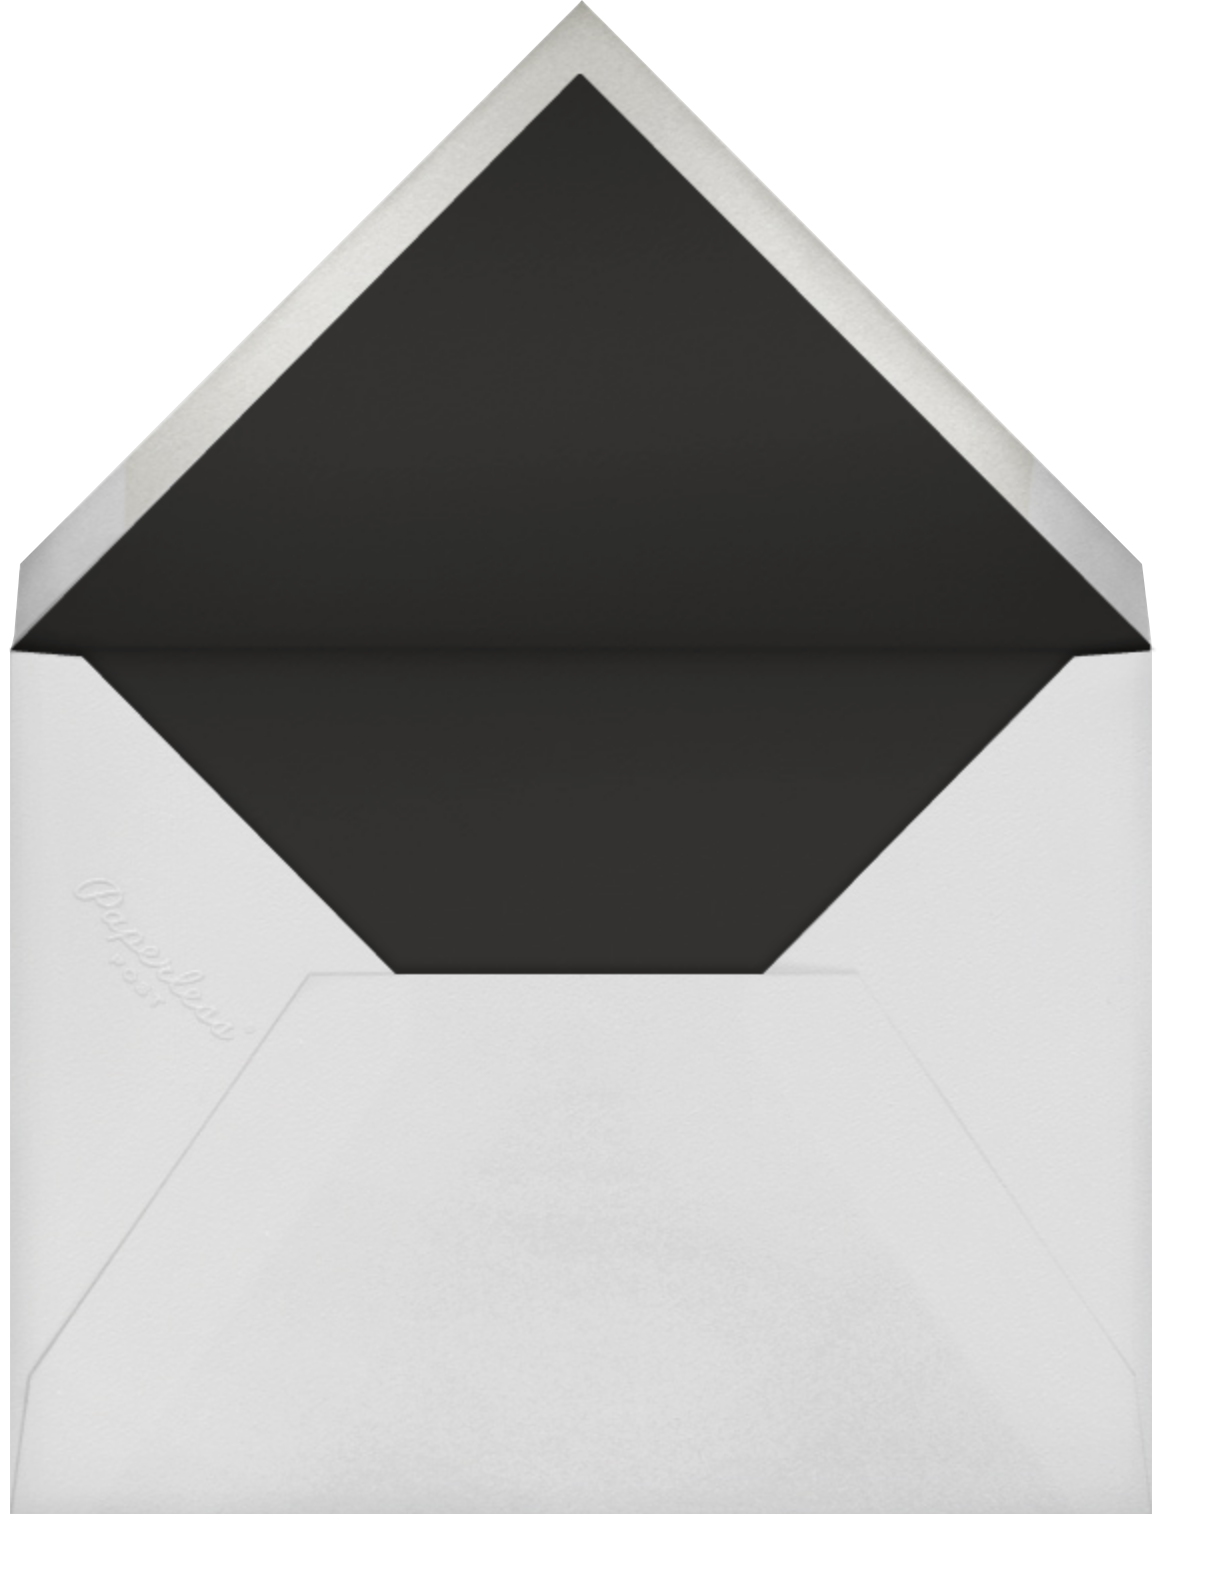 Noland - Silver - Paperless Post - Envelope